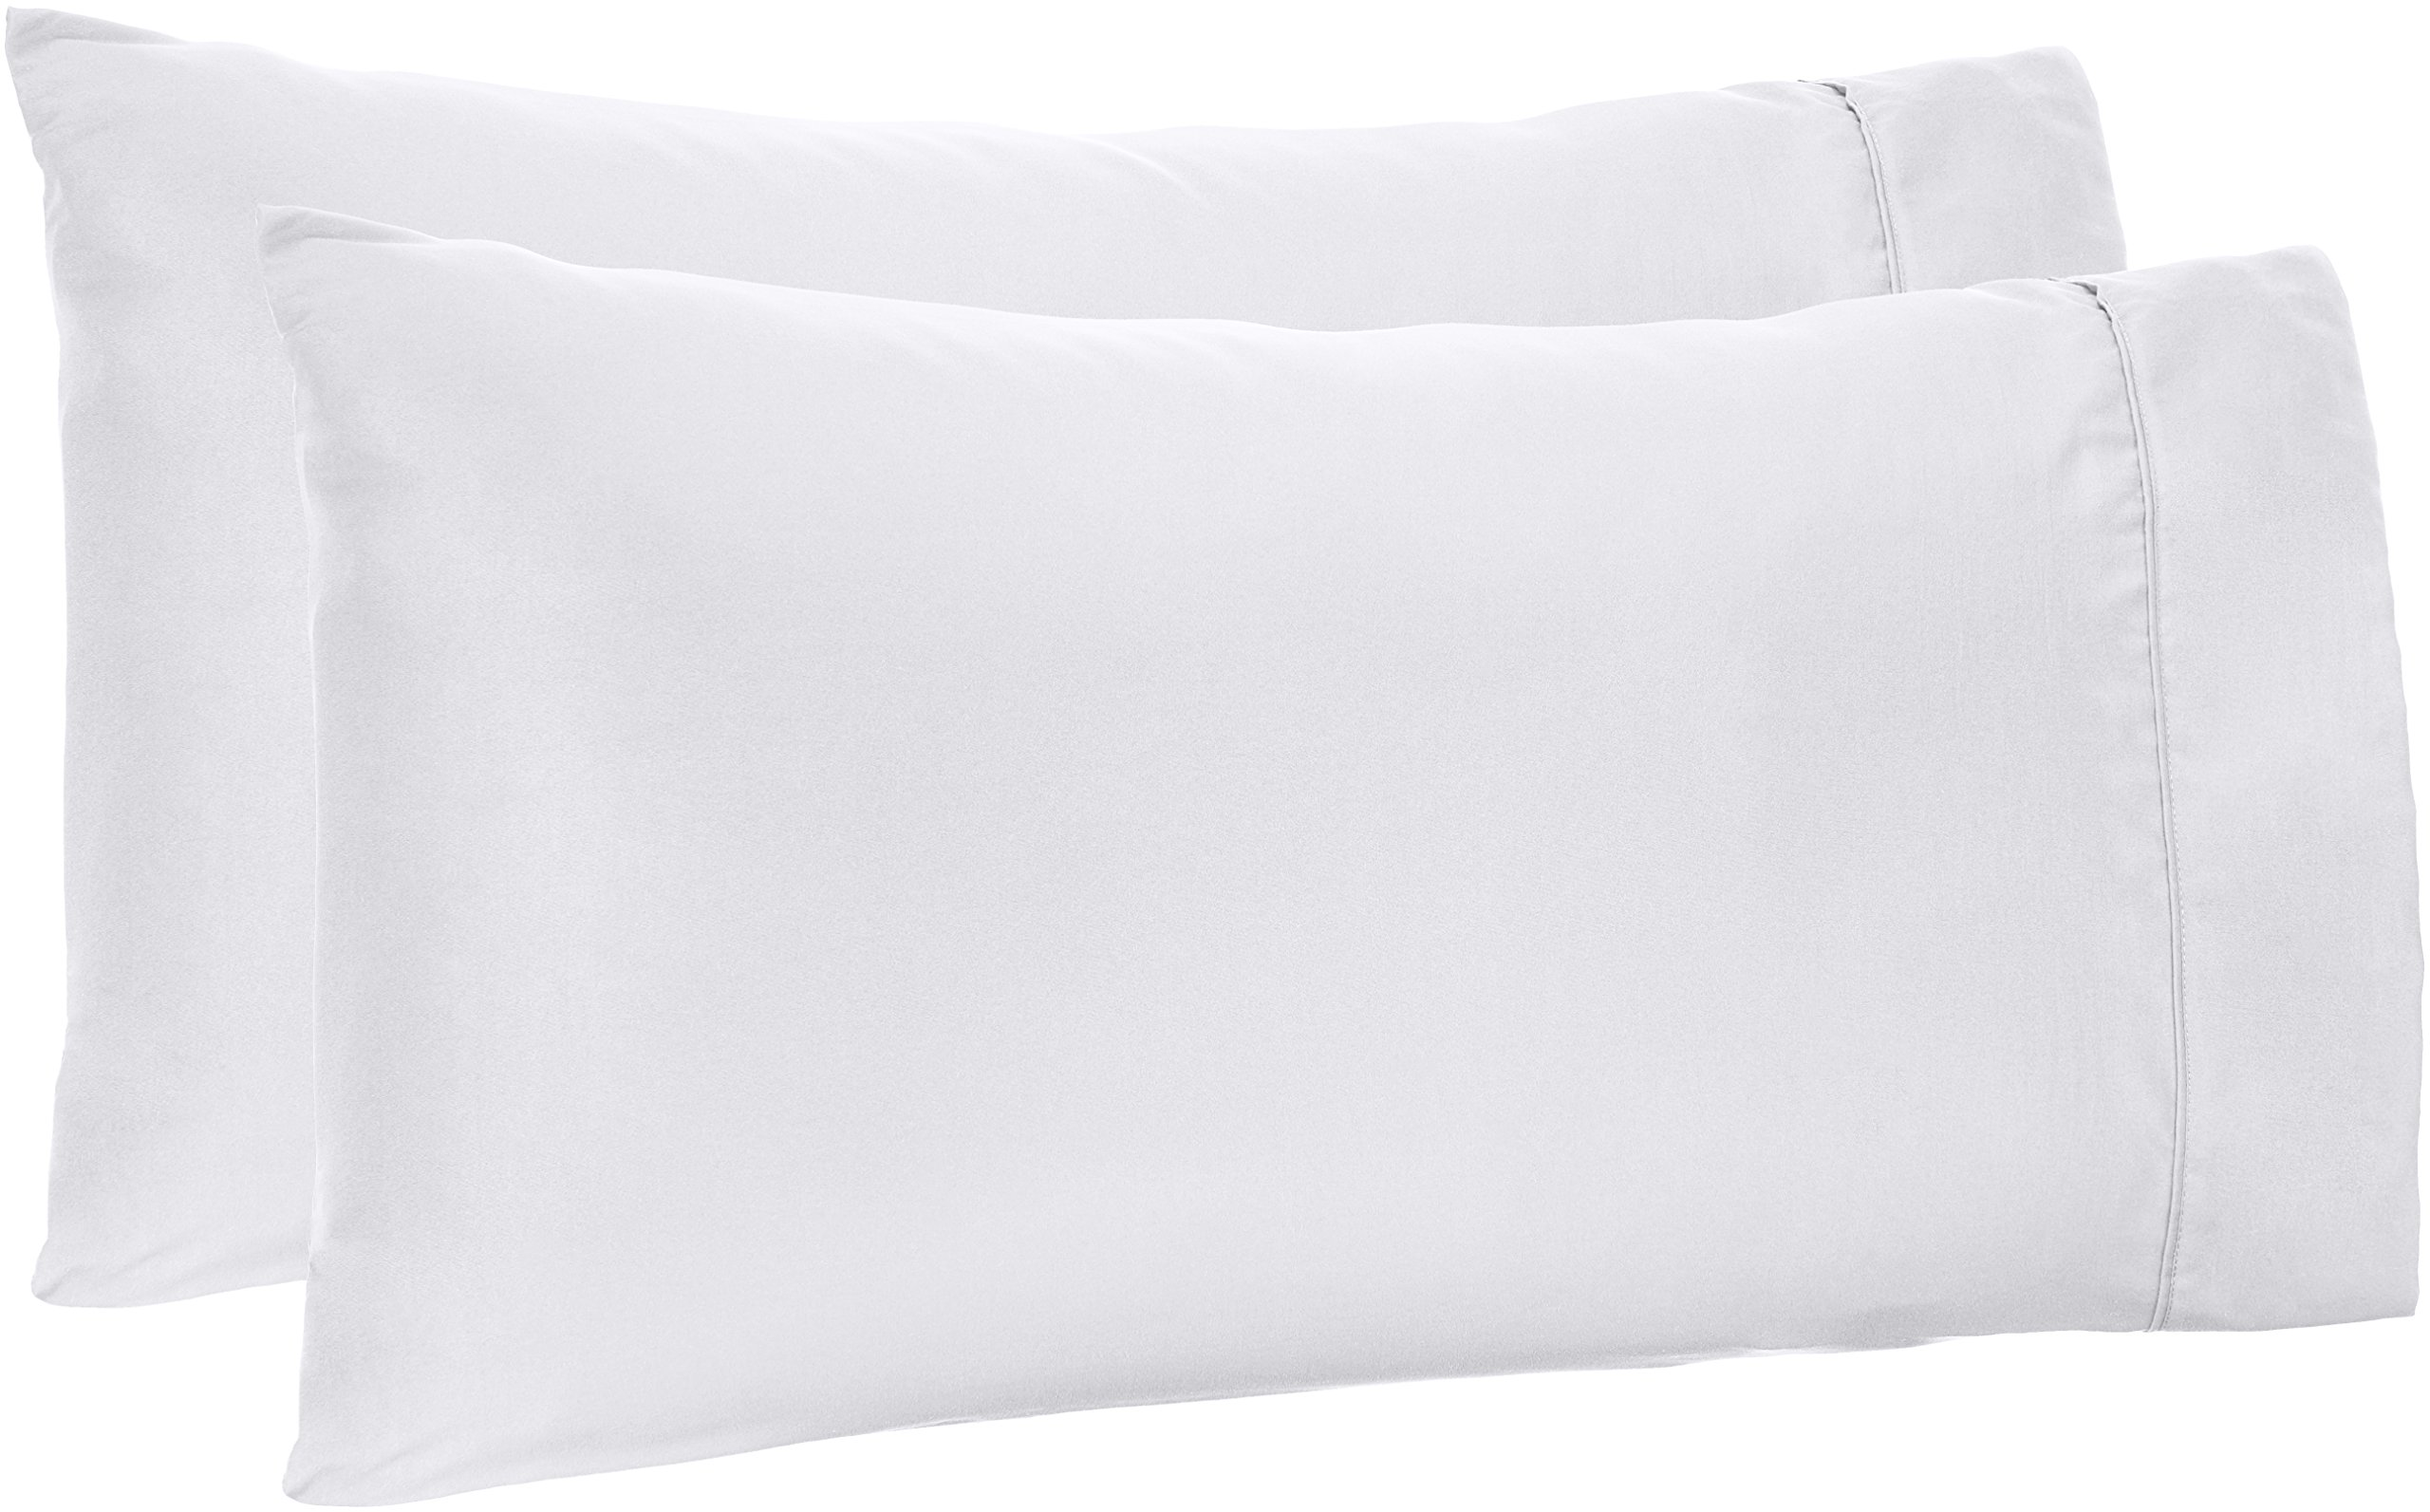 AmazonBasics Microfiber Pillowcases - 2-Pack, King, Bright White